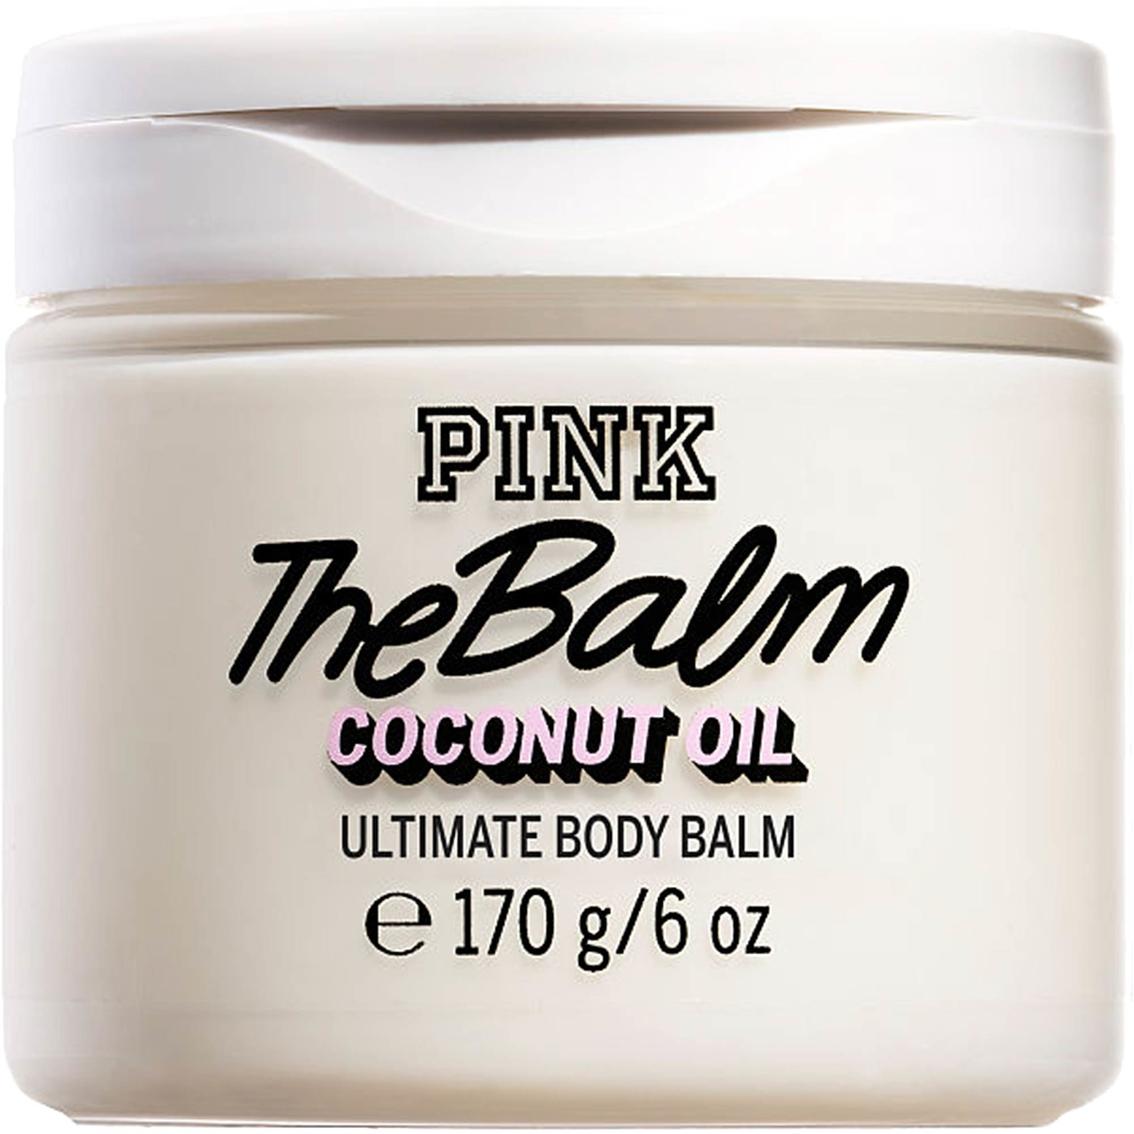 3464d8a06f501 Victoria's Secret Pink The Balm Coconut Oil Ultimate Body Balm ...